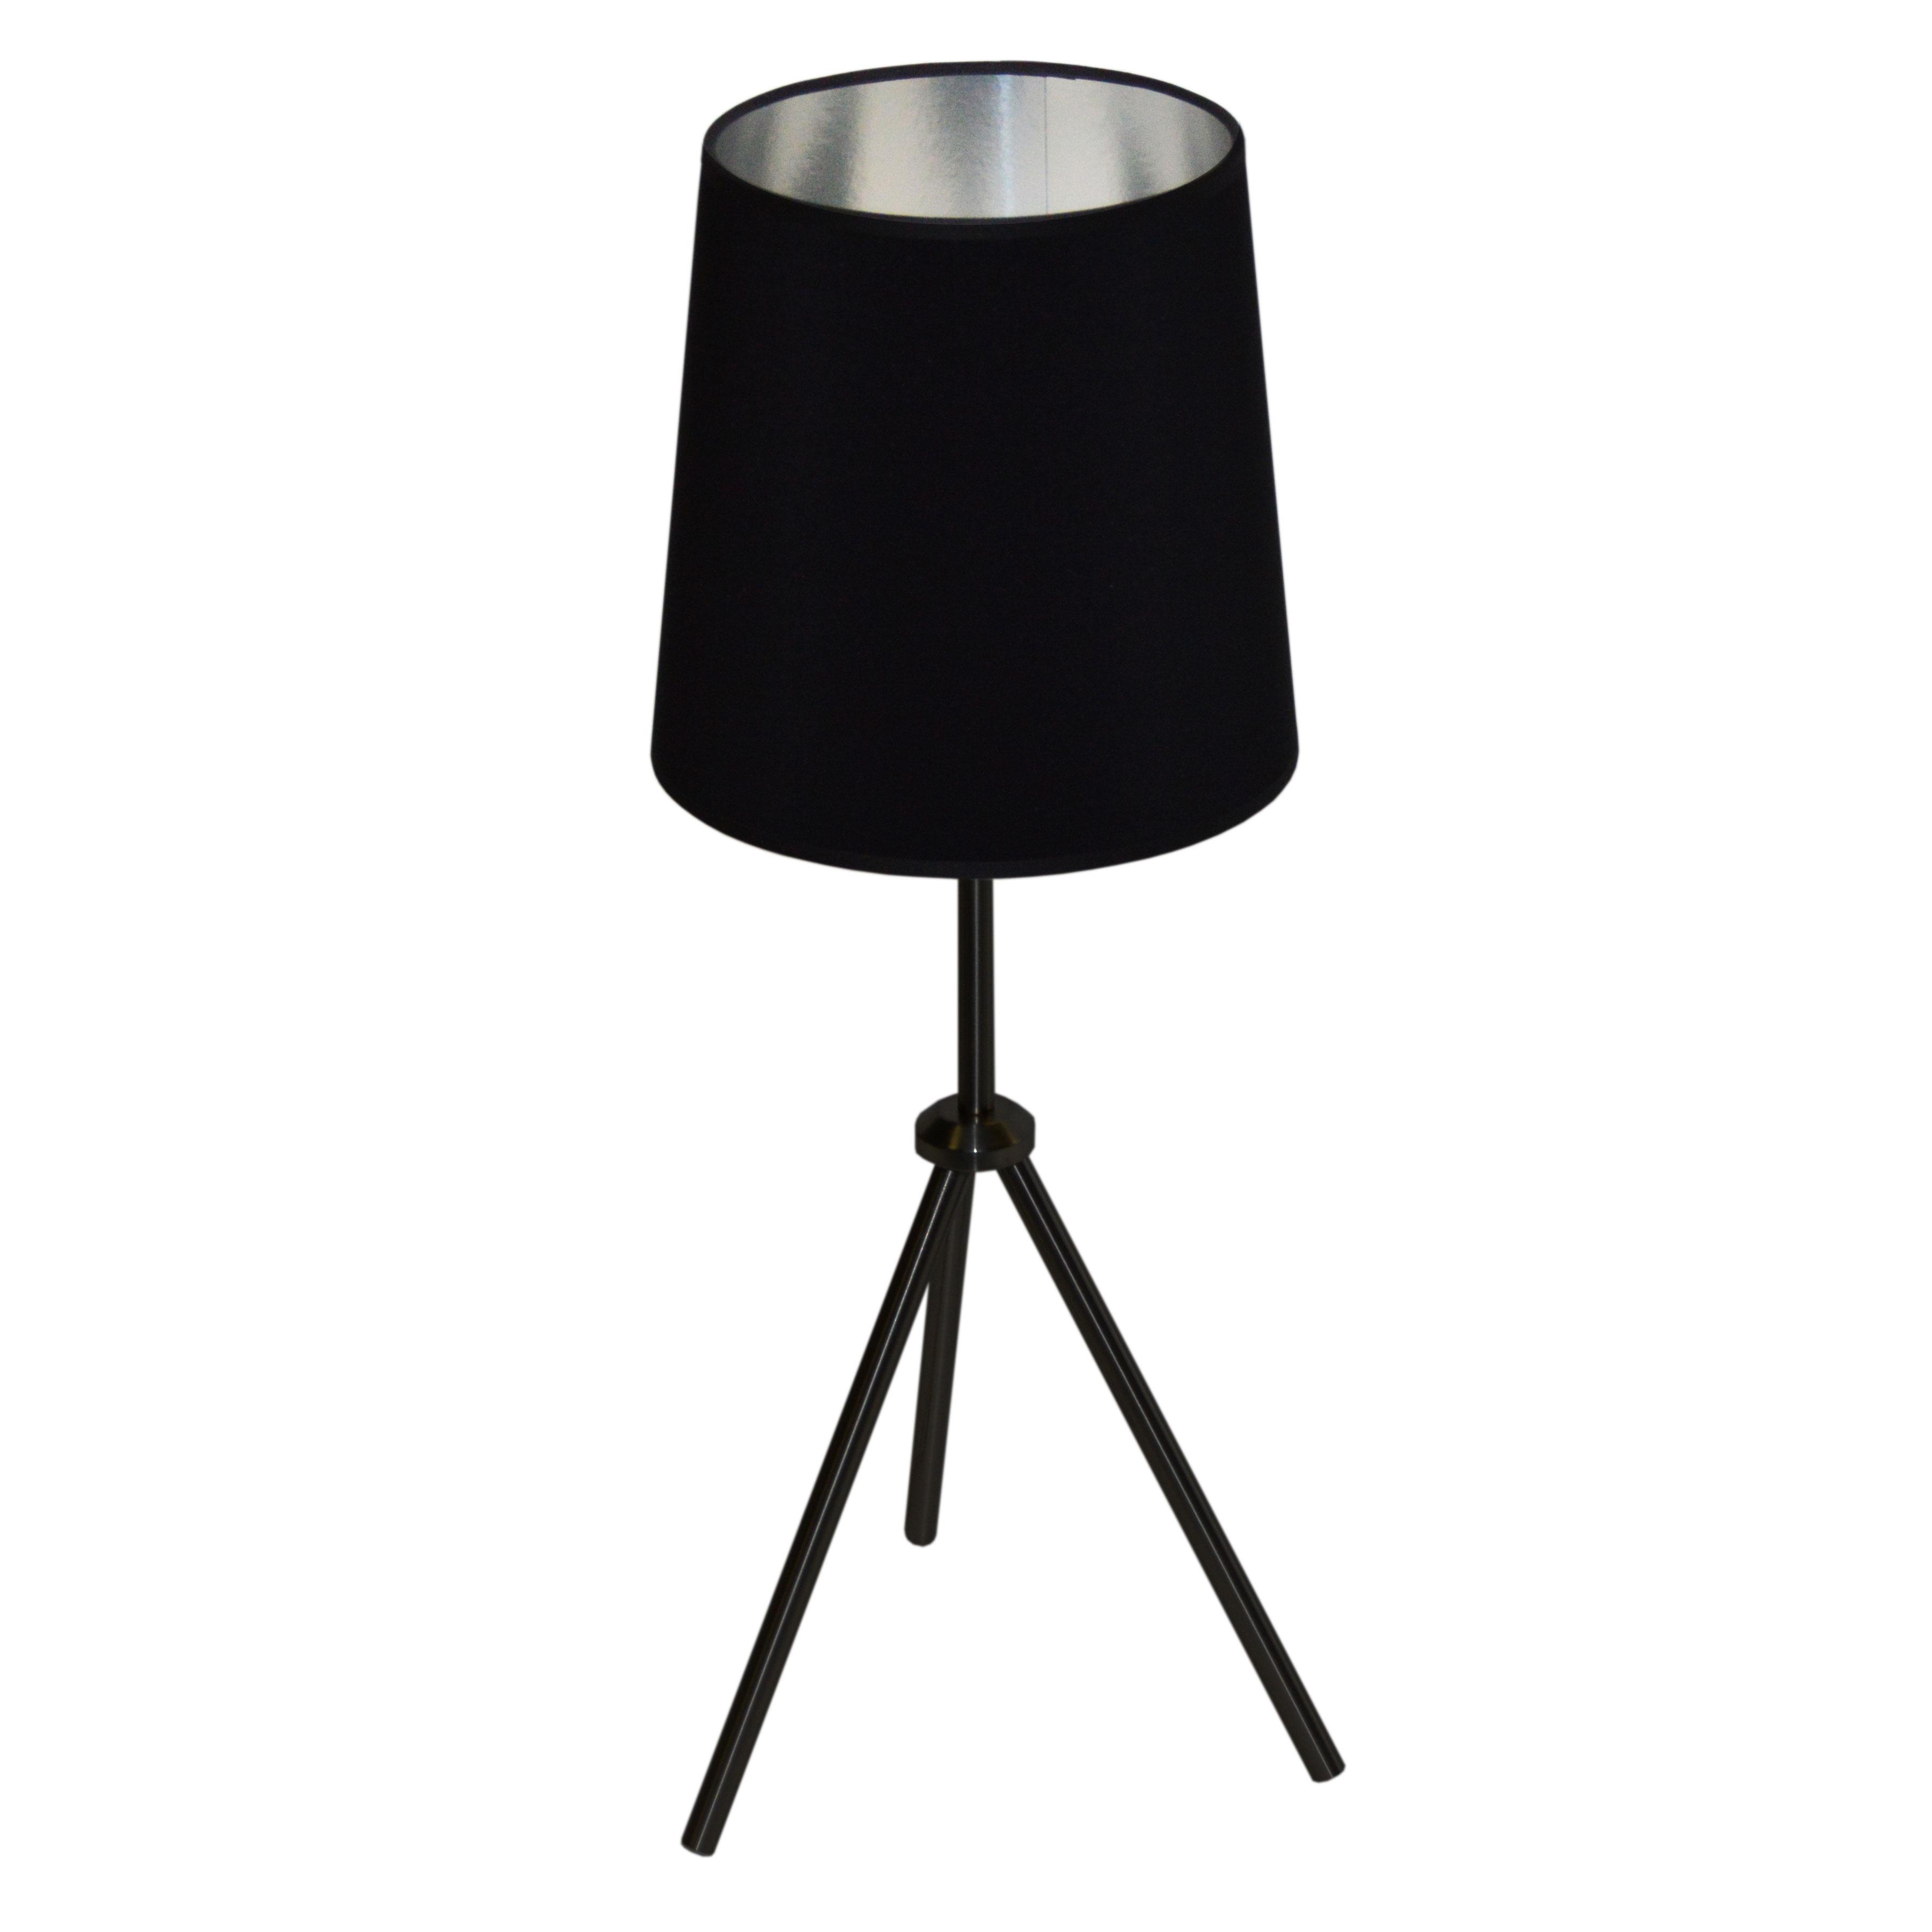 1LT 3 Leg Drum Table Fixture w/BK-SV Shd